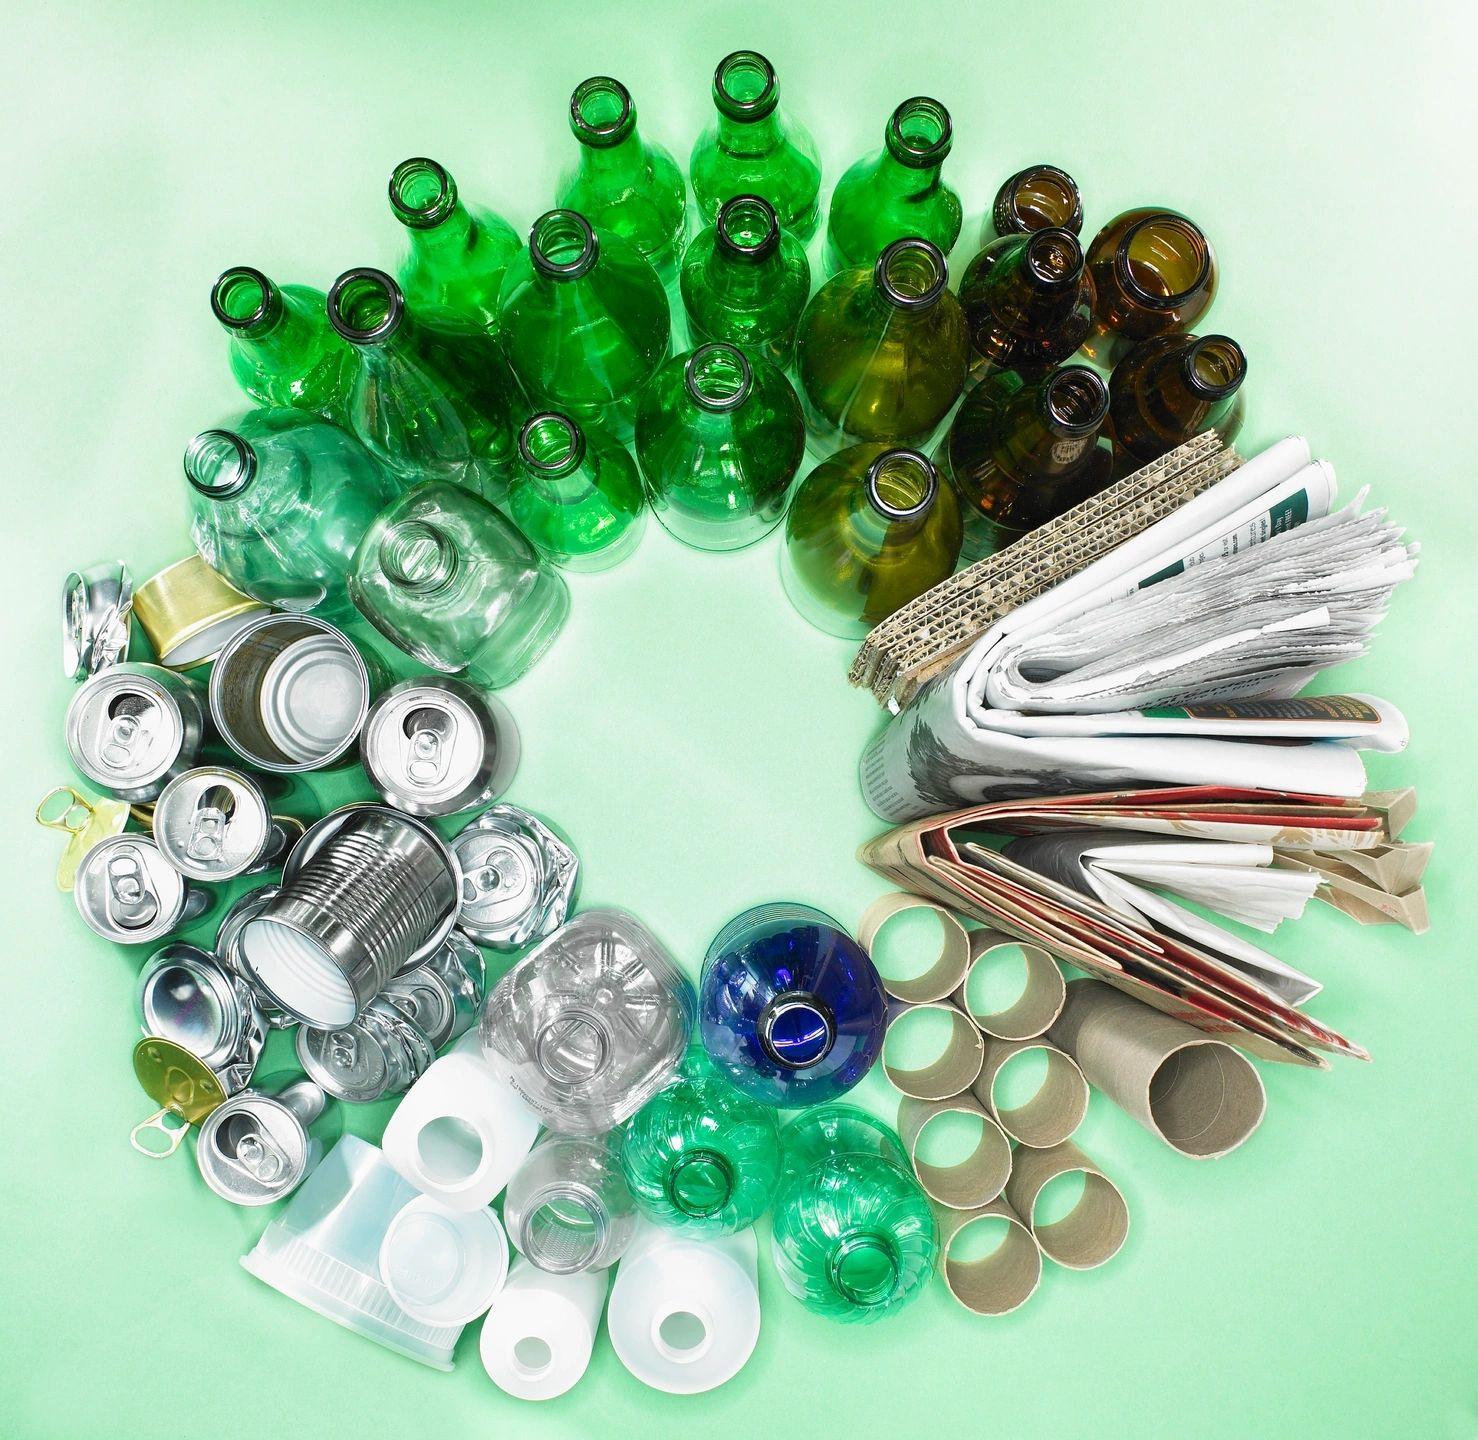 6 Zero Waste Tips You May Already Be Doing